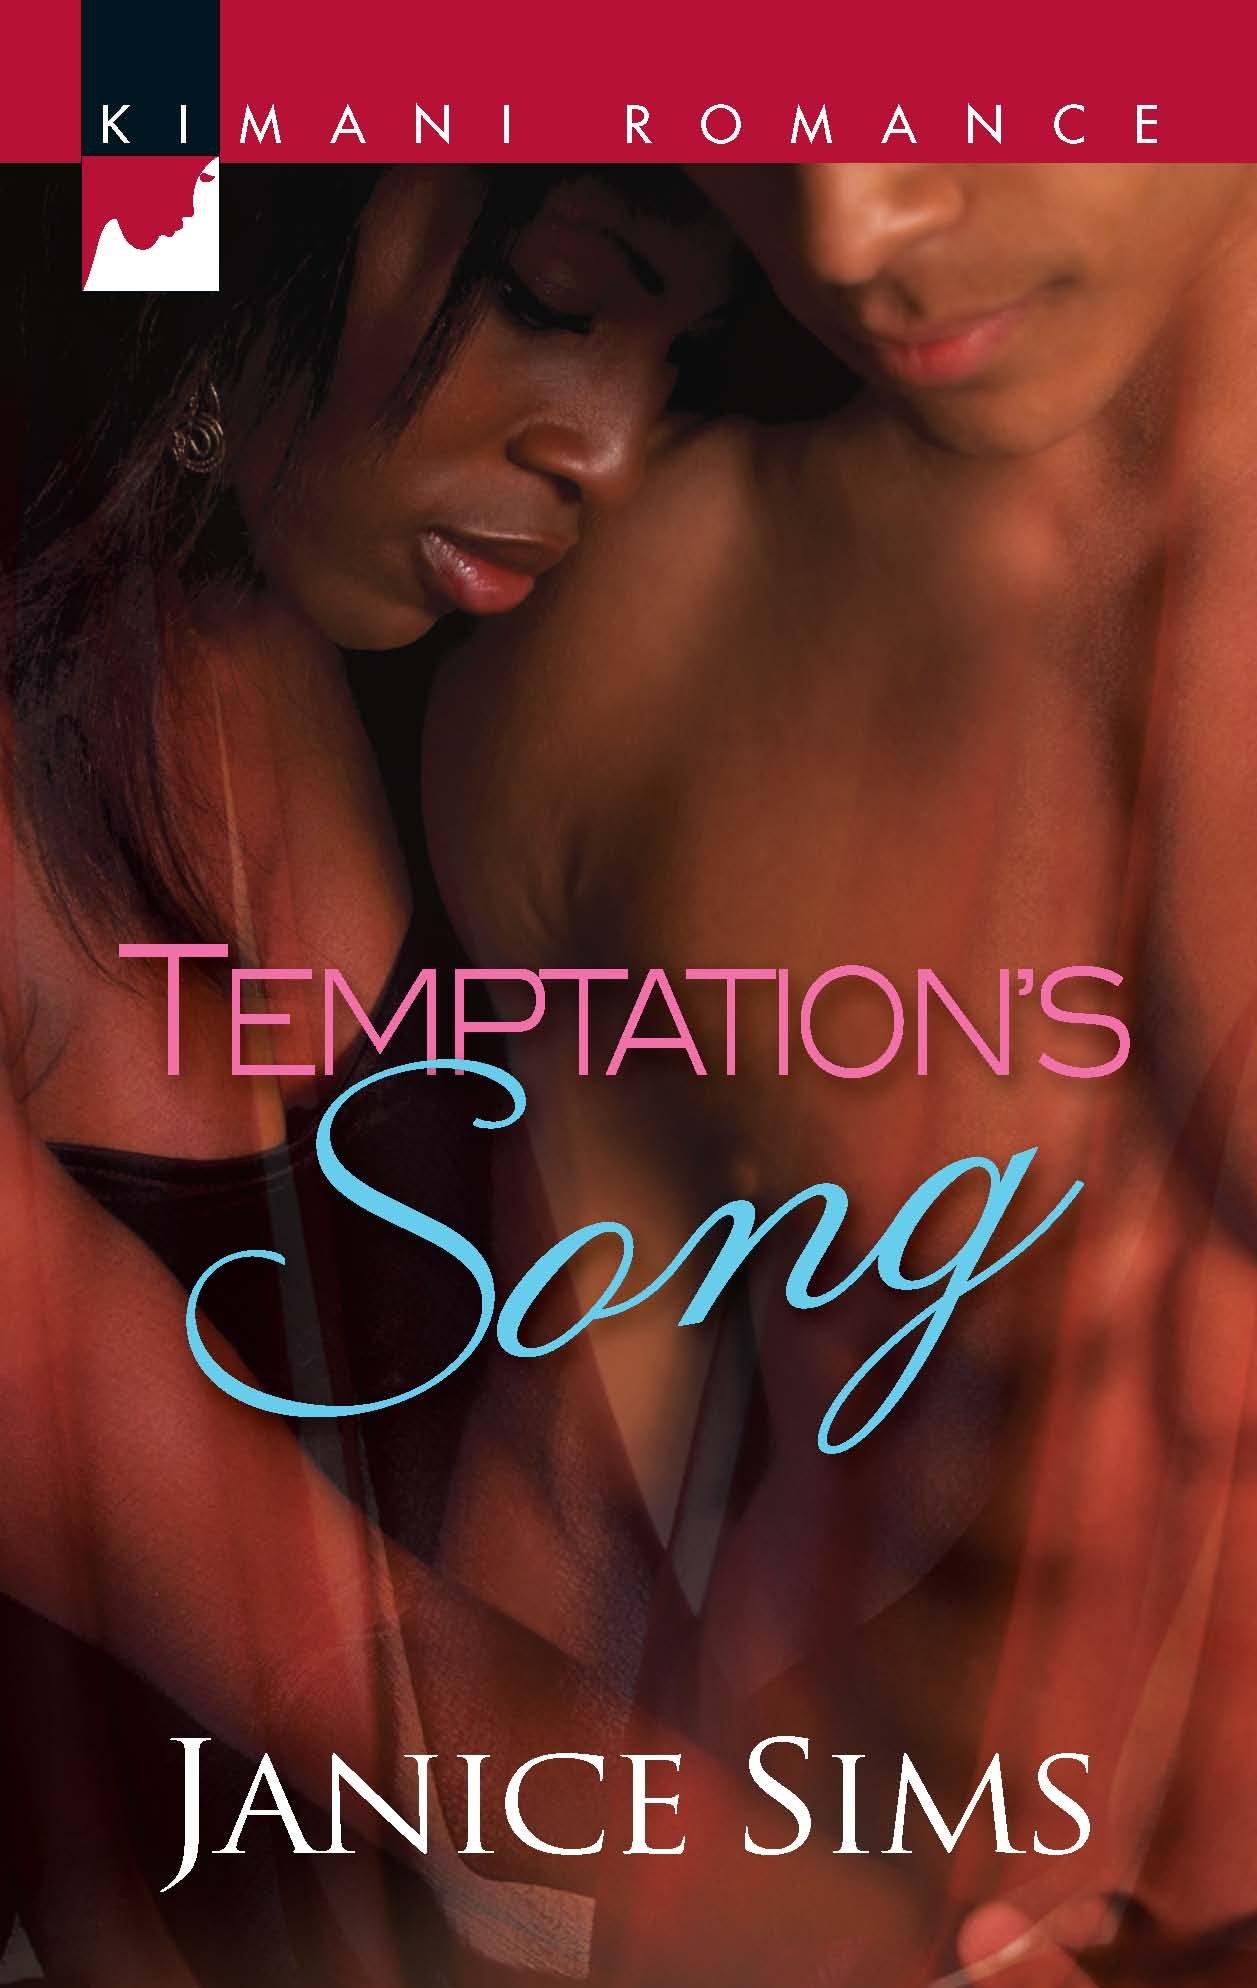 Amazon.com: Temptation's Song (Kimani Romance) (9780373861705): Janice  Sims: Books